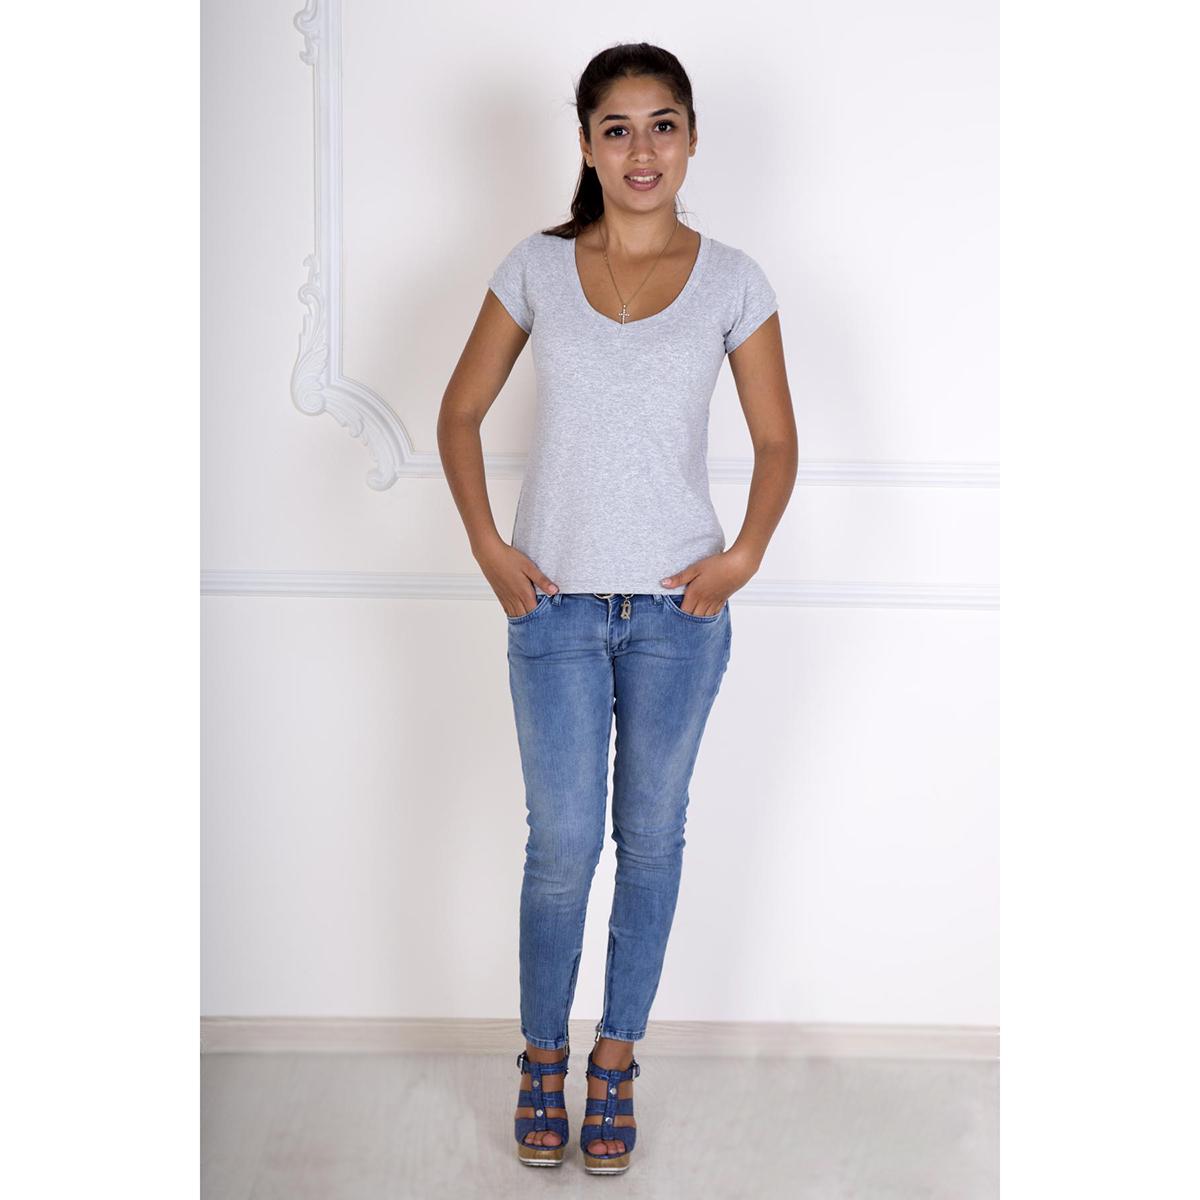 Женская футболка Лиза Серый, размер 46Блузки, майки, кофты<br>Обхват груди:92 см<br>Обхват талии:74 см<br>Обхват бедер:100 см<br>Длина по спинке:54 см<br>Рост:167 см<br><br>Тип: Жен. футболка<br>Размер: 46<br>Материал: Фулайкра